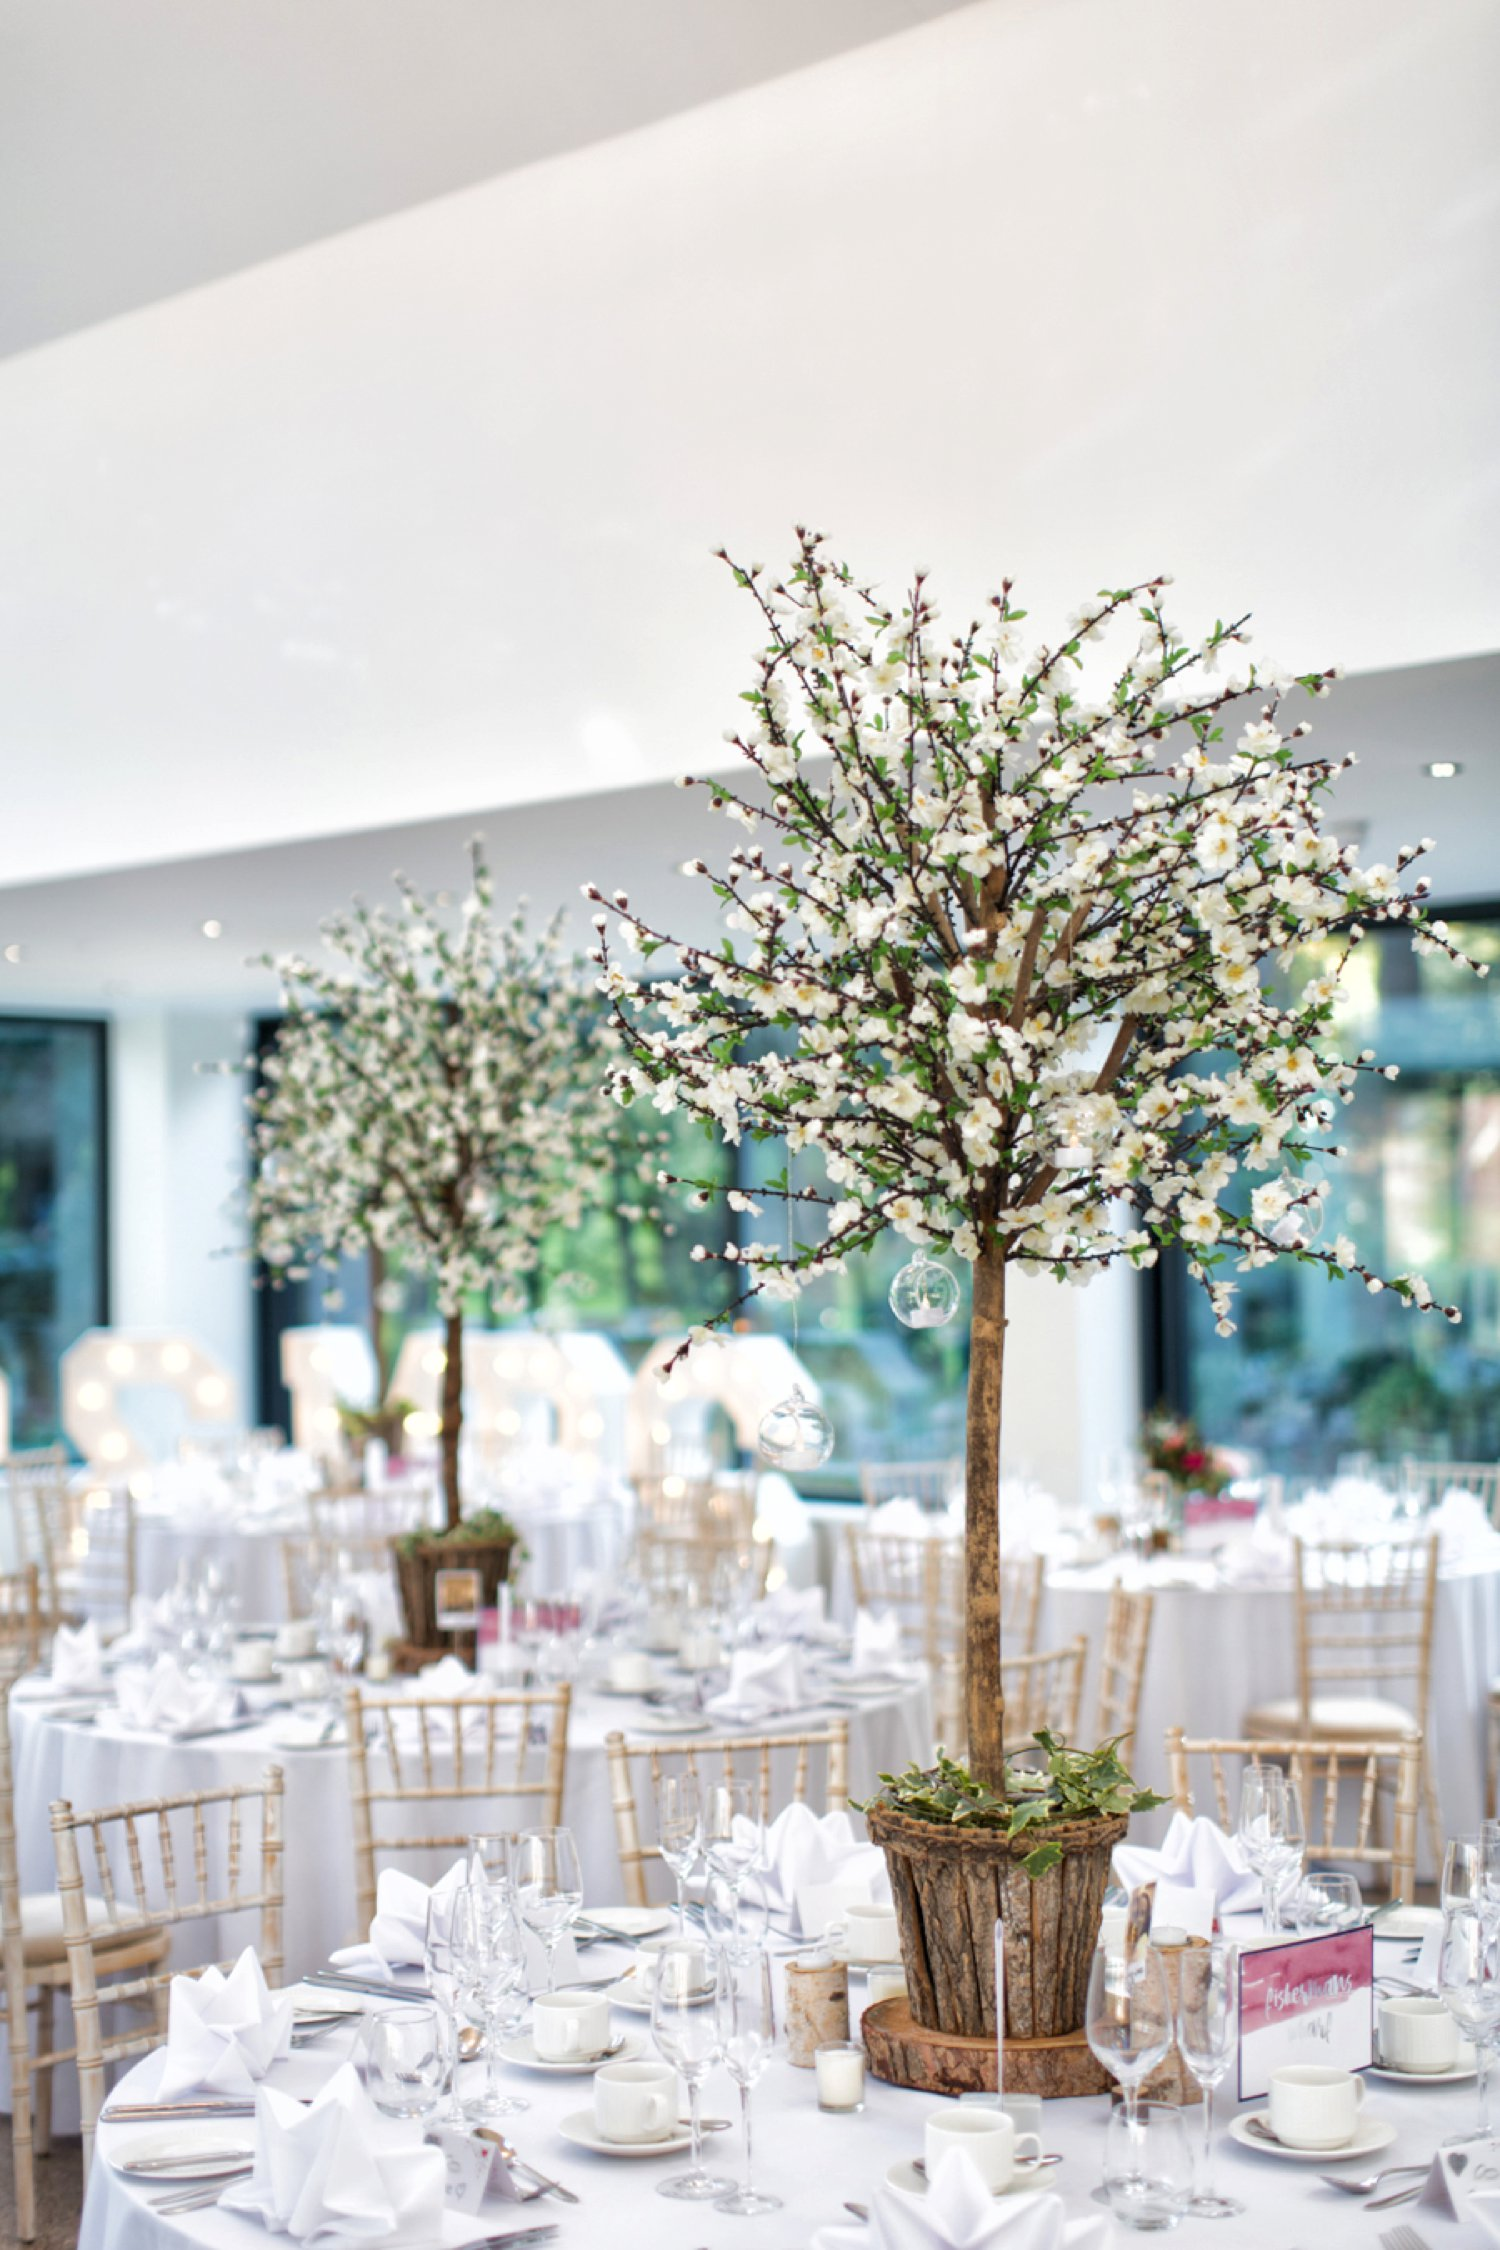 blossom trees in wedding breakfast